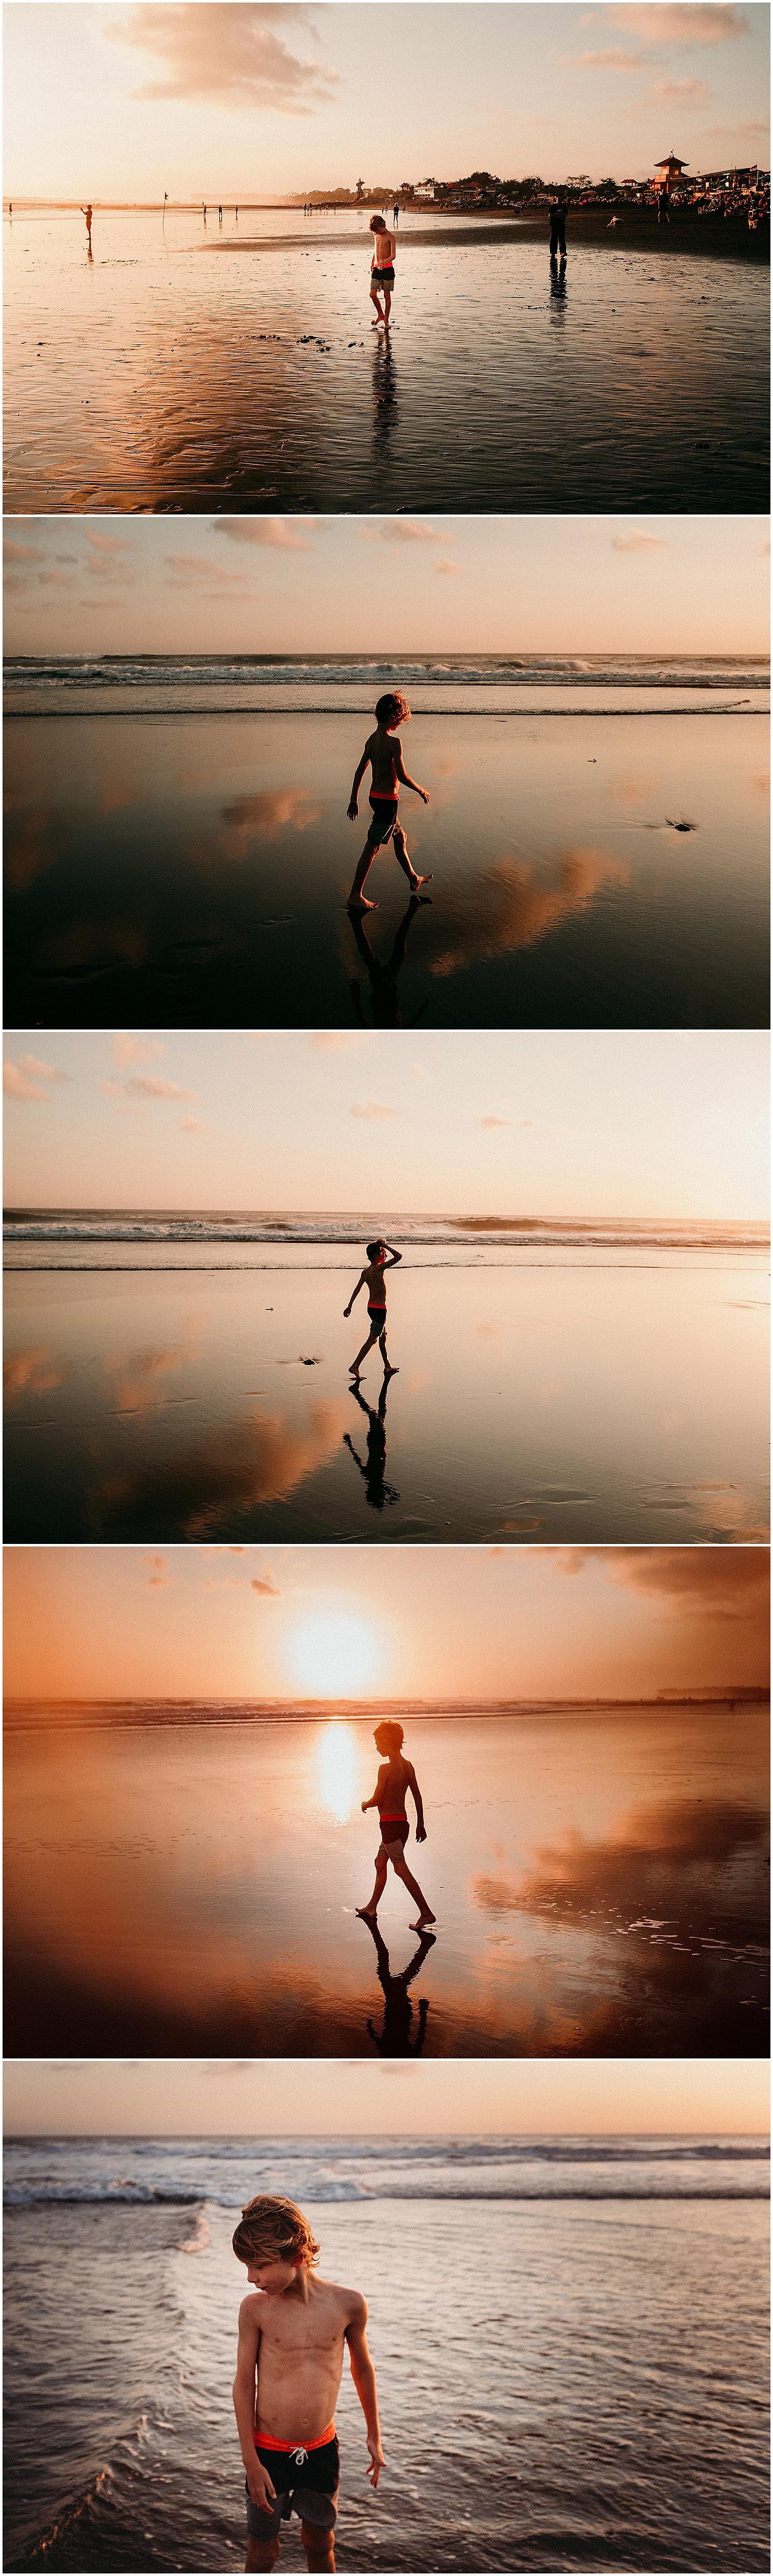 Bali-canguu-low-tide-sunset